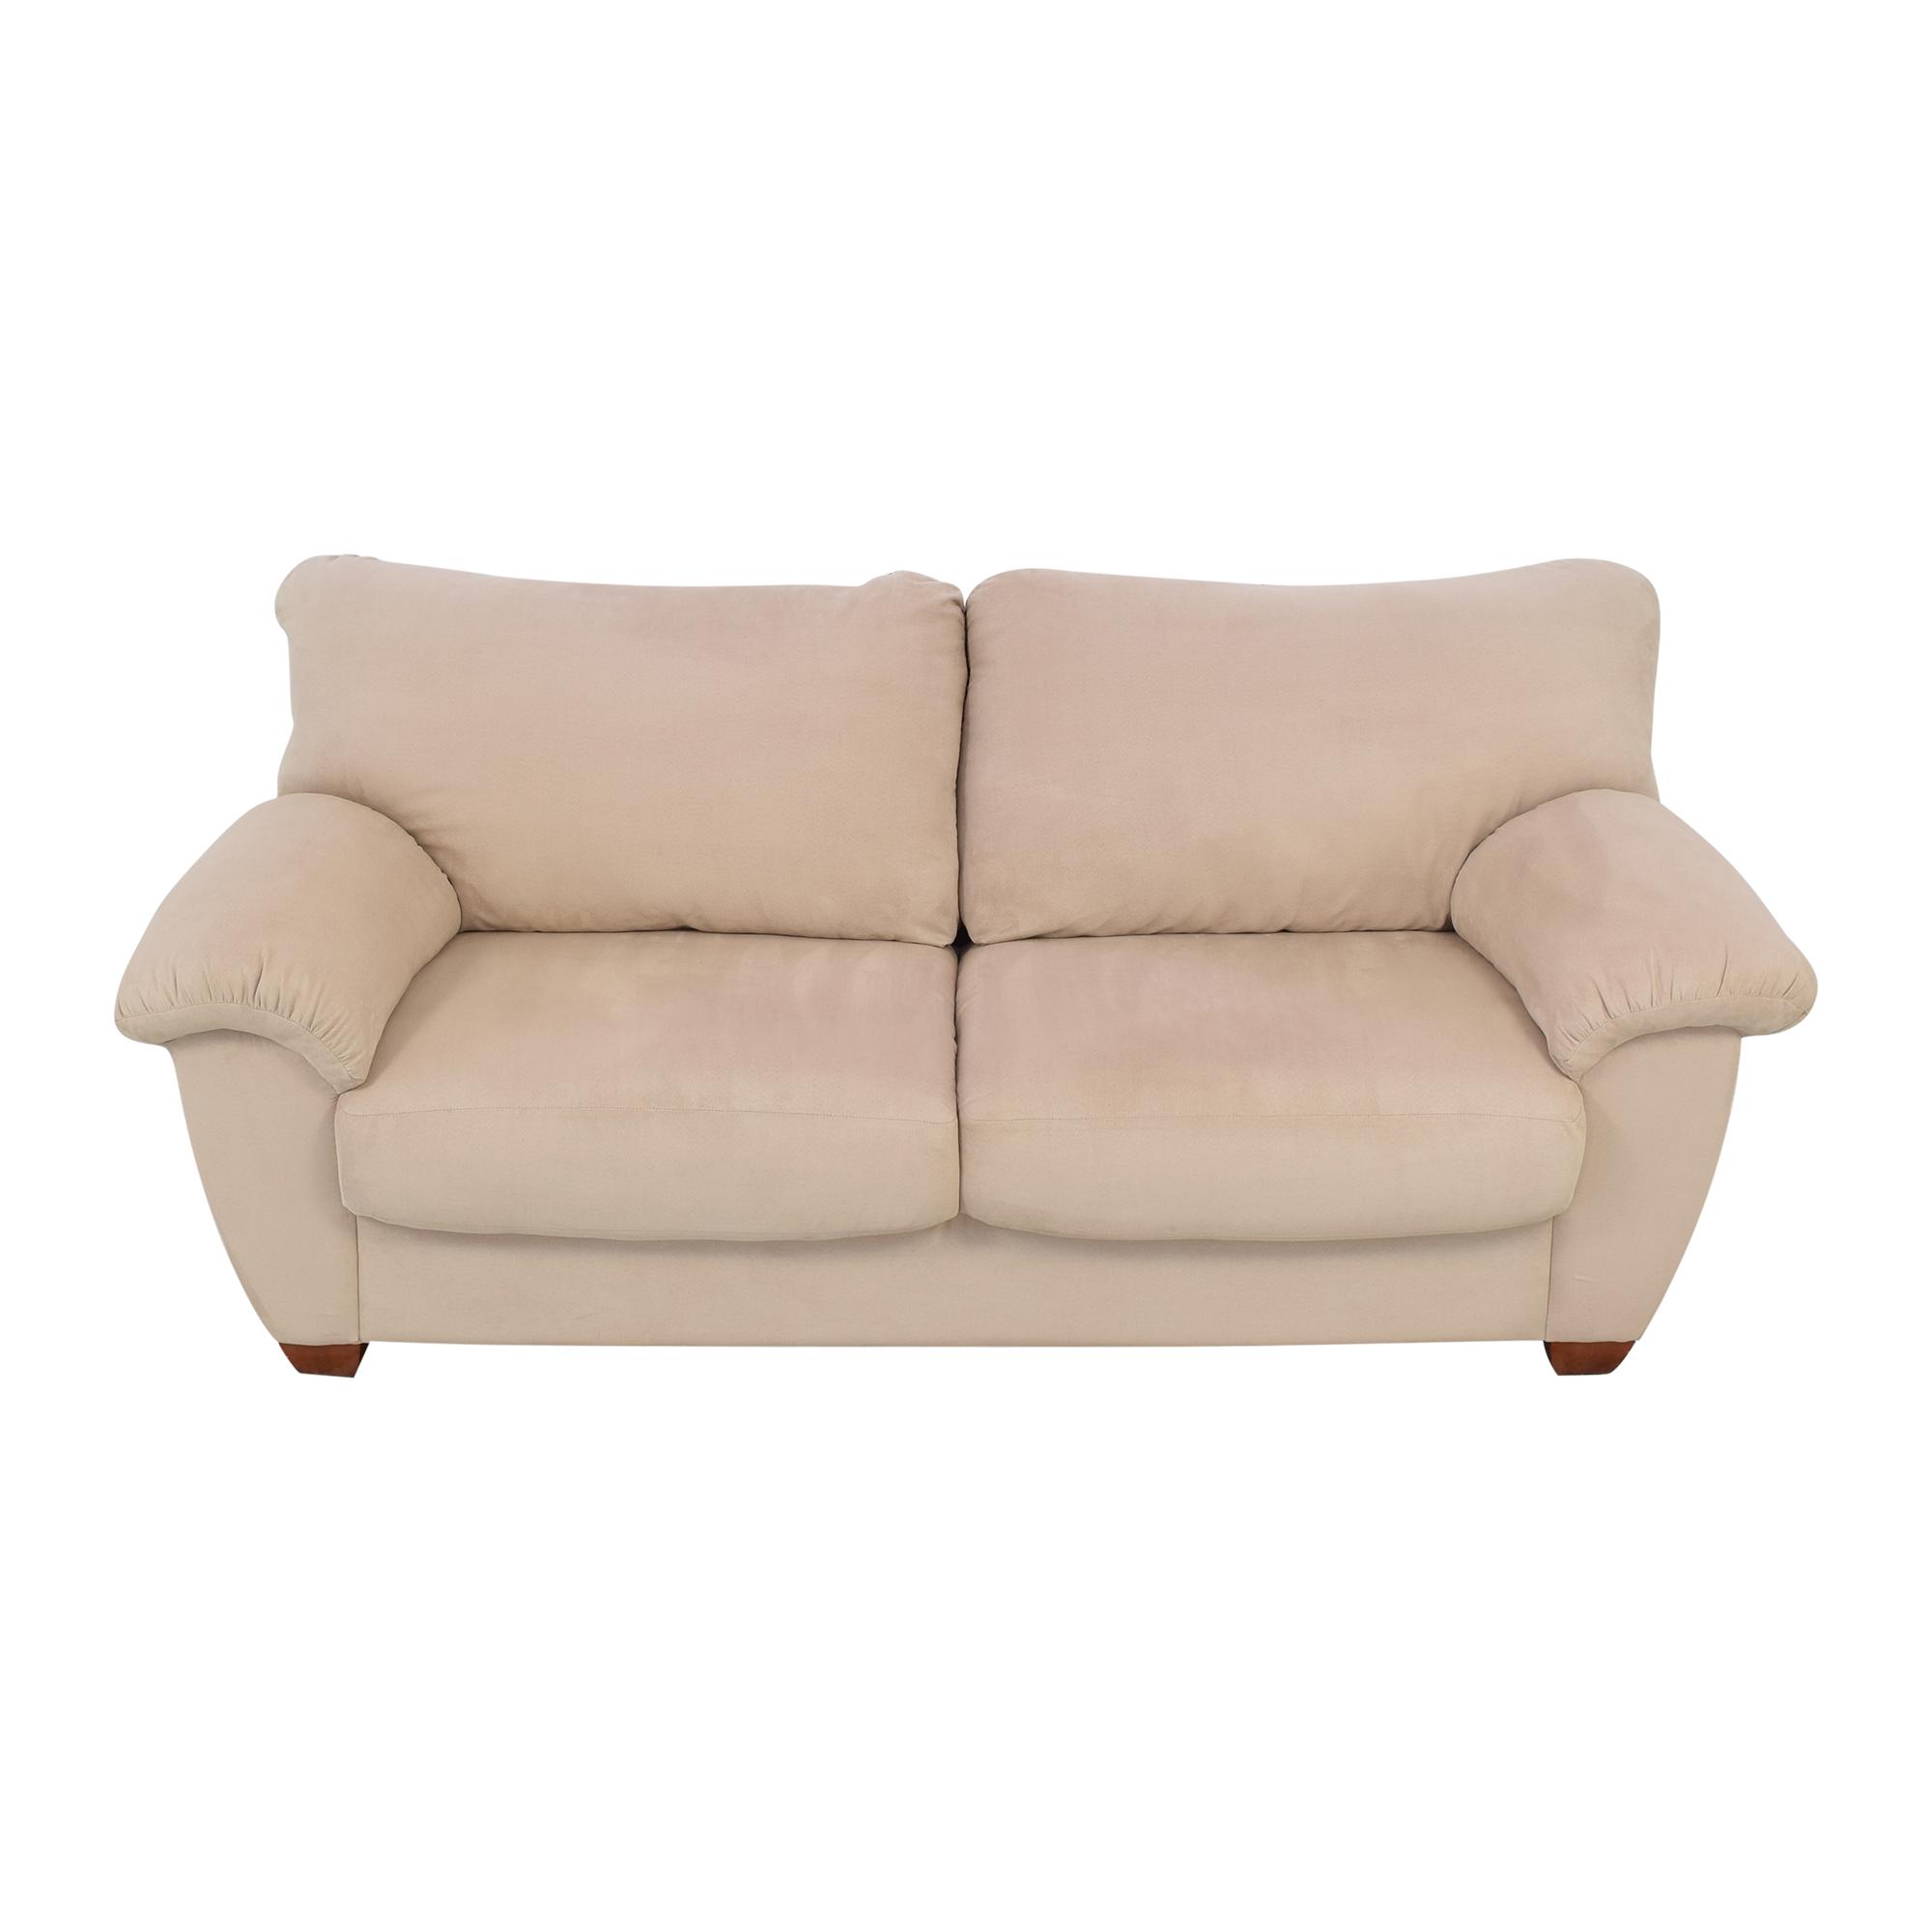 Two Cushion Sofa price